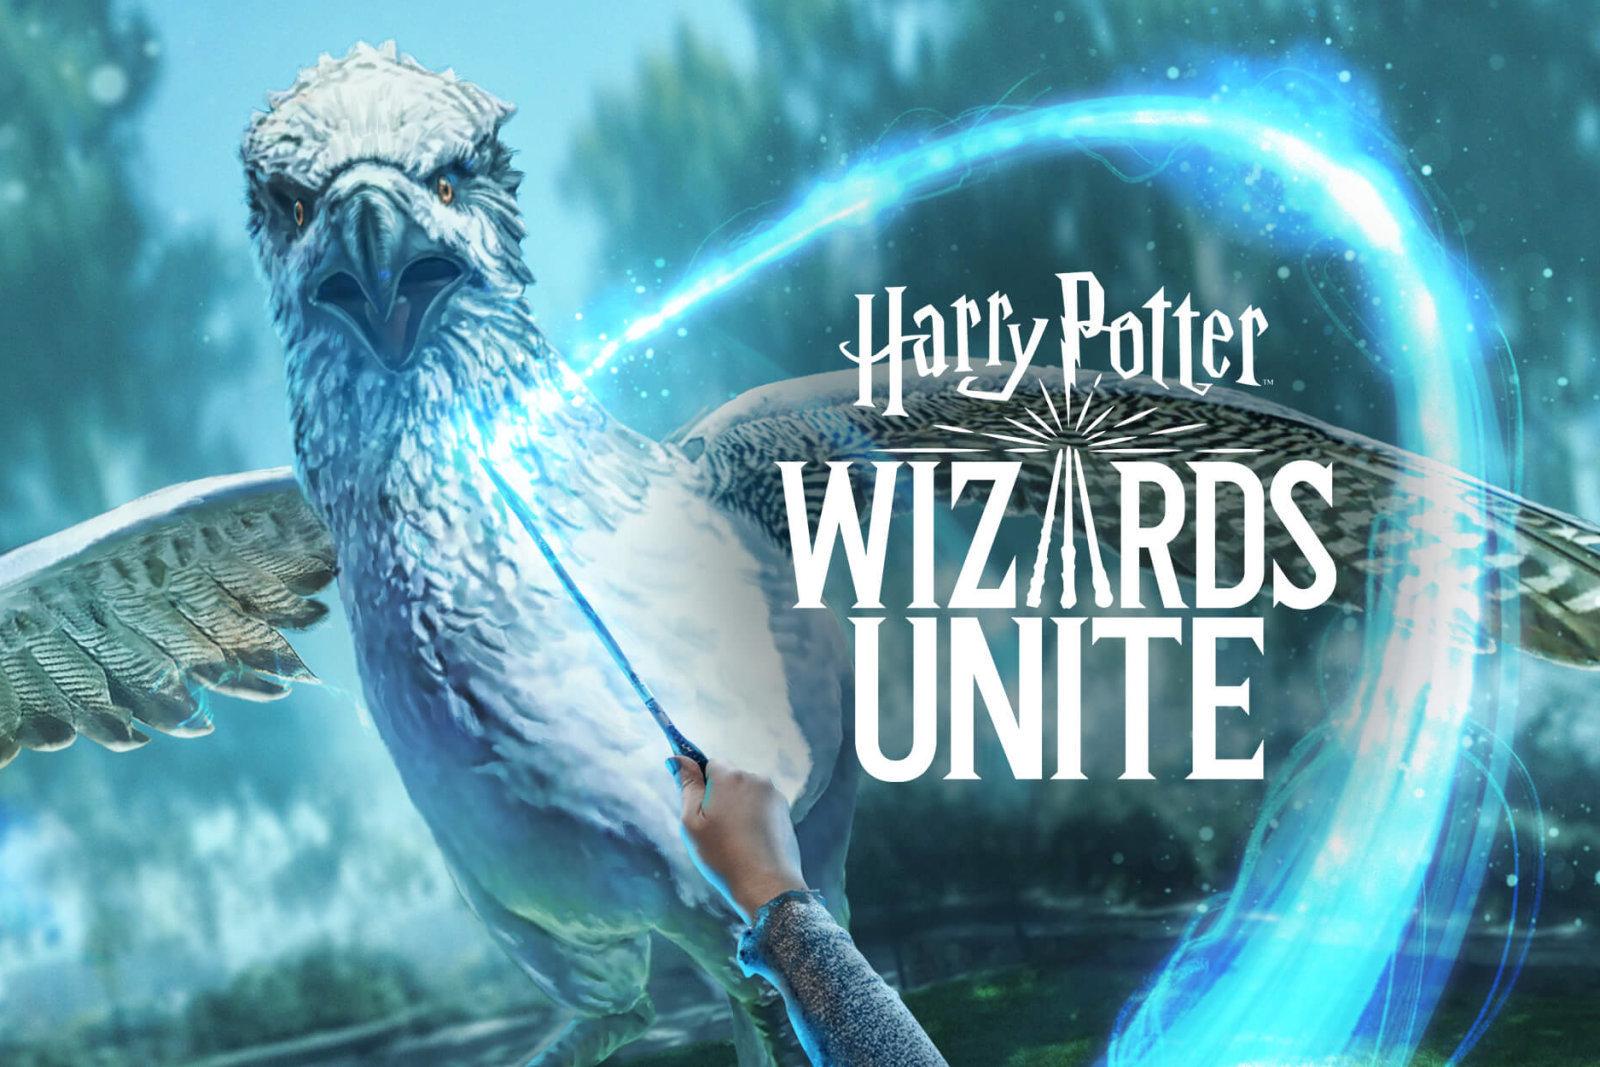 Harry Potter WIZARDS UNITE 画像